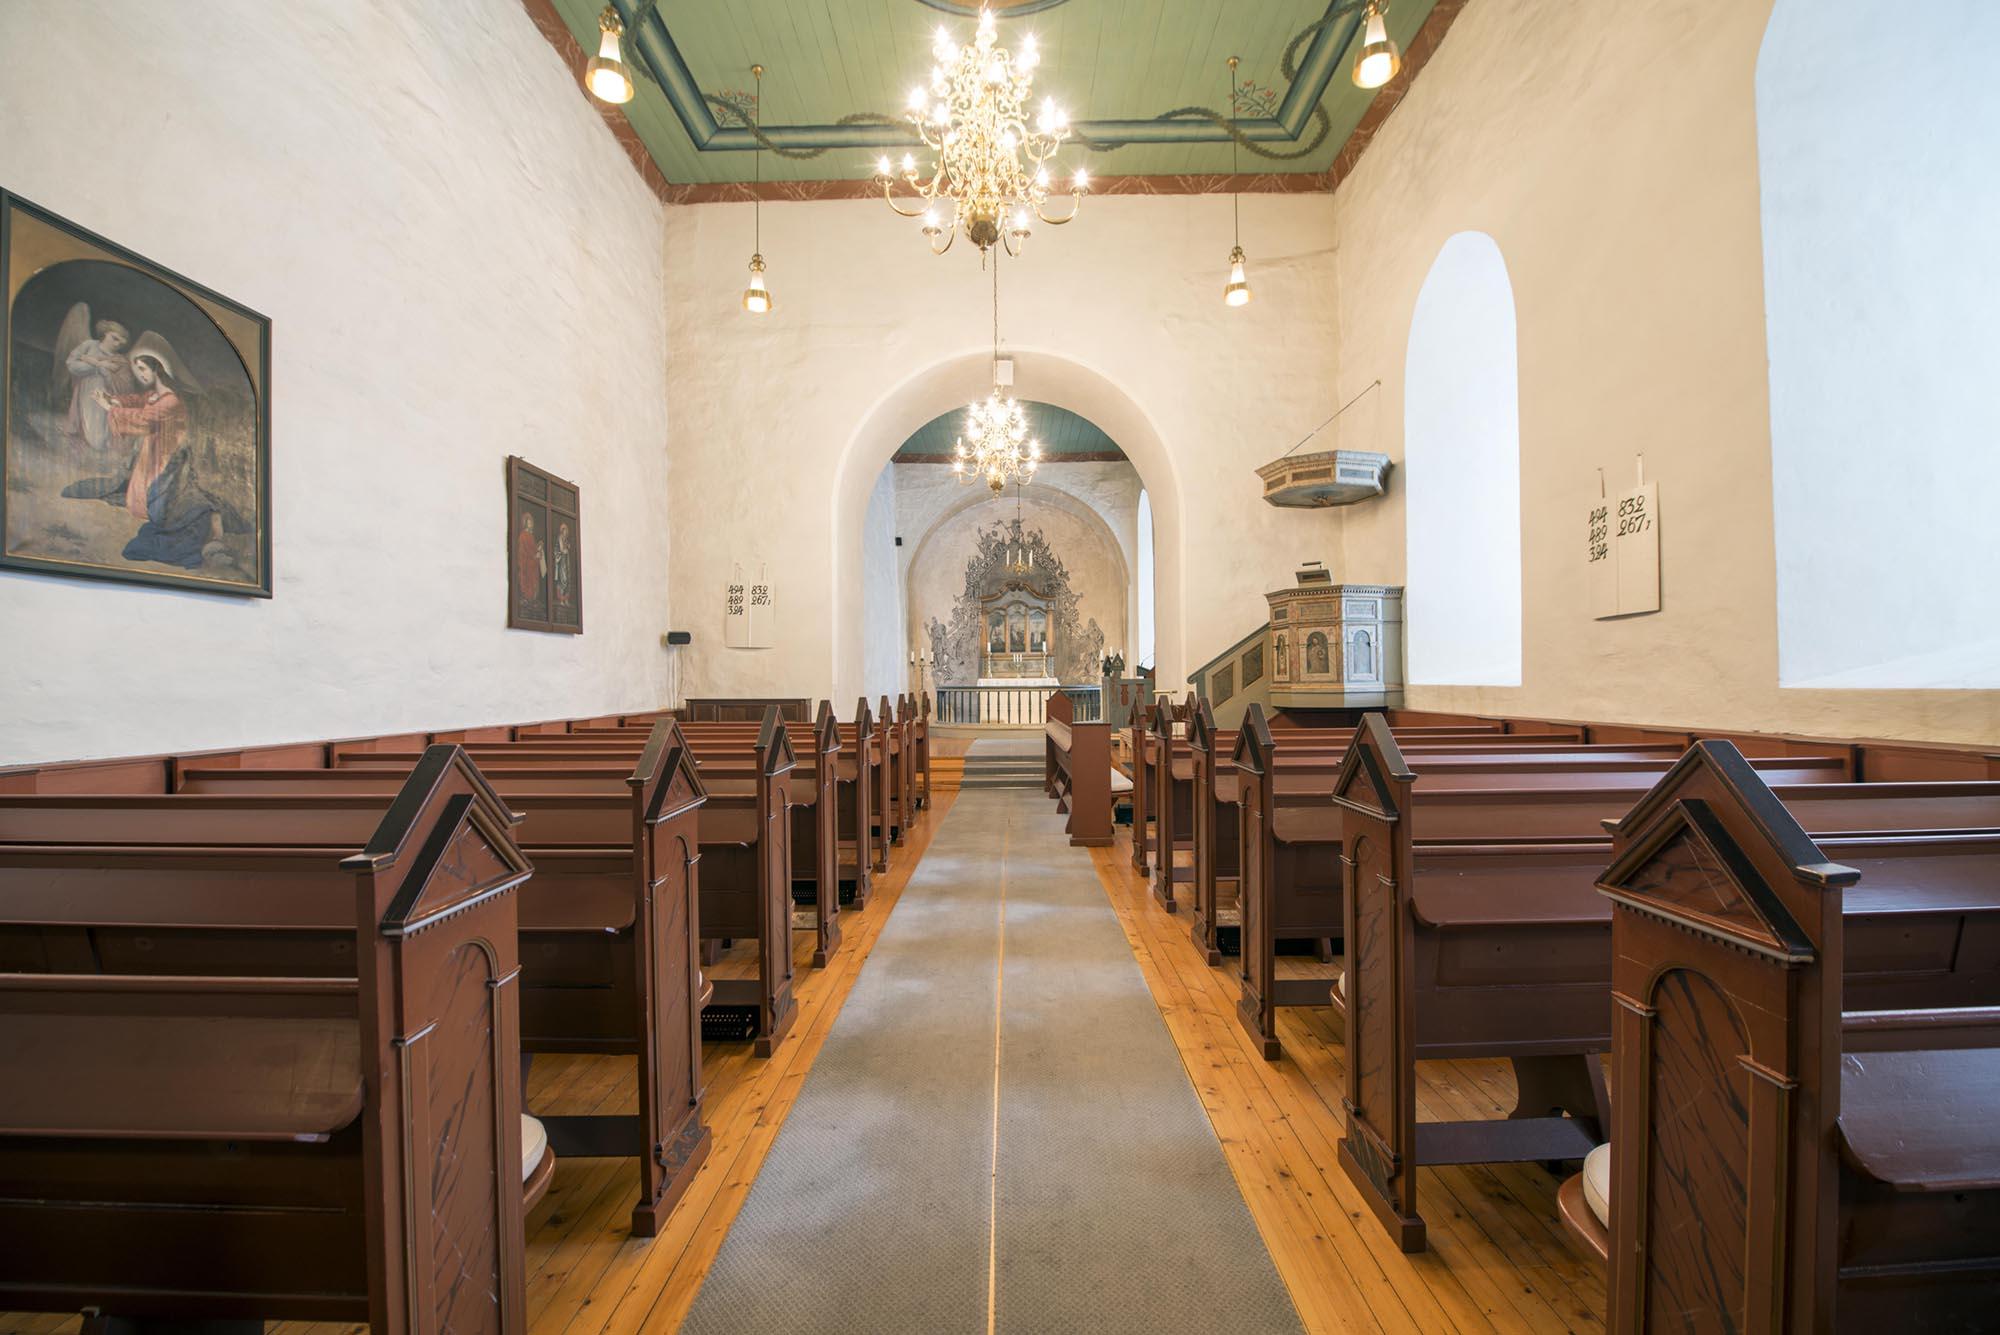 Efteløt kirke. Foto: Bjørn Isaksen/3600.no